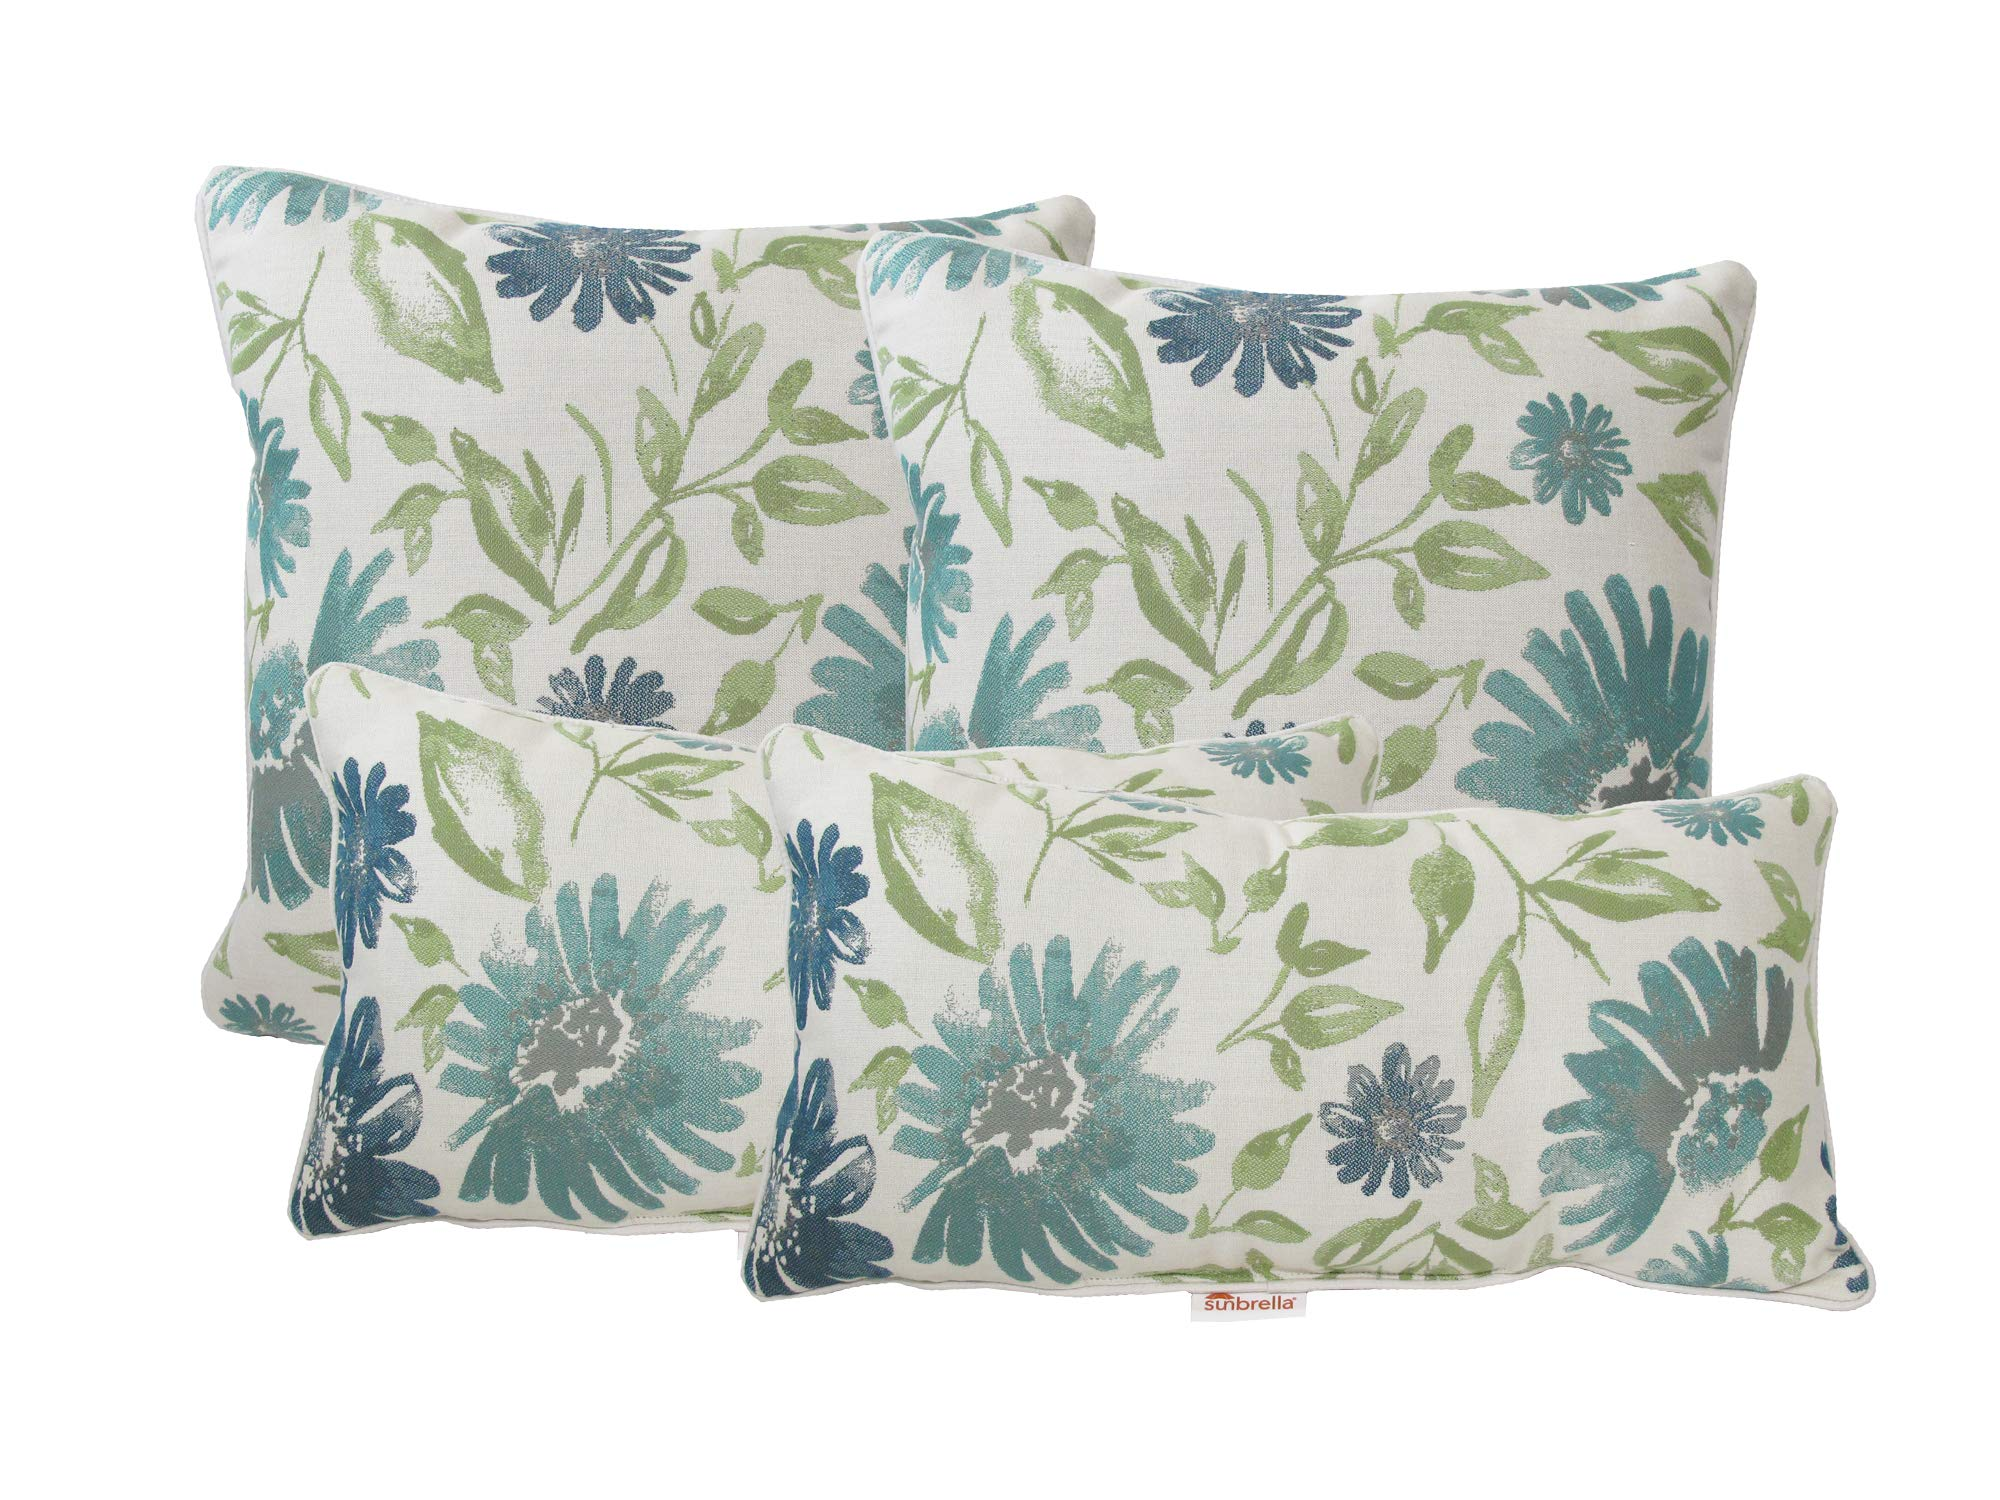 kingrattan.com Made in USA Sunbrella Violetta Baltic Corded Pillows (4-Pack)